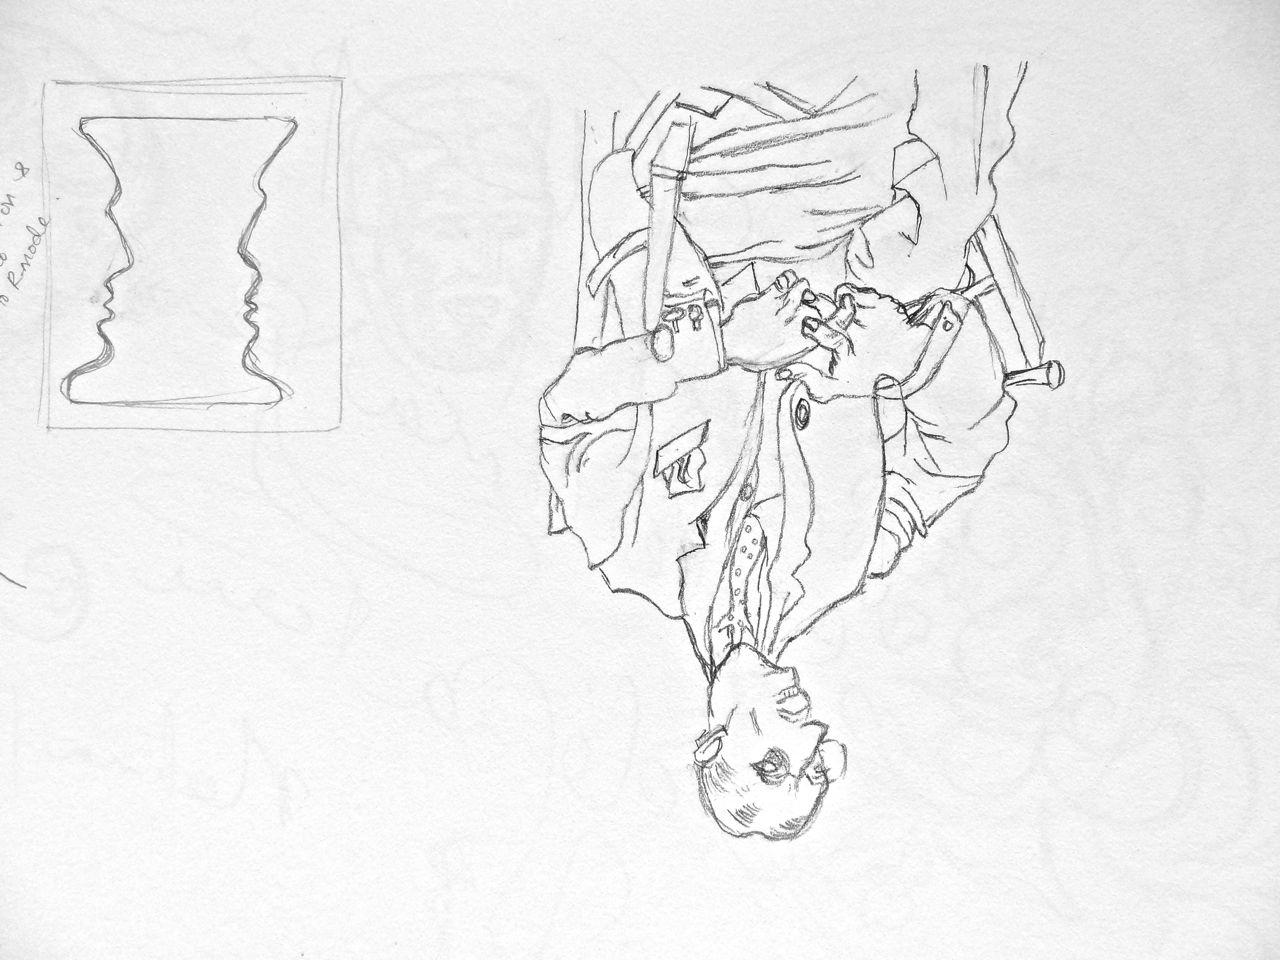 Upside Down Contour Line Drawing : Portrait man drawing